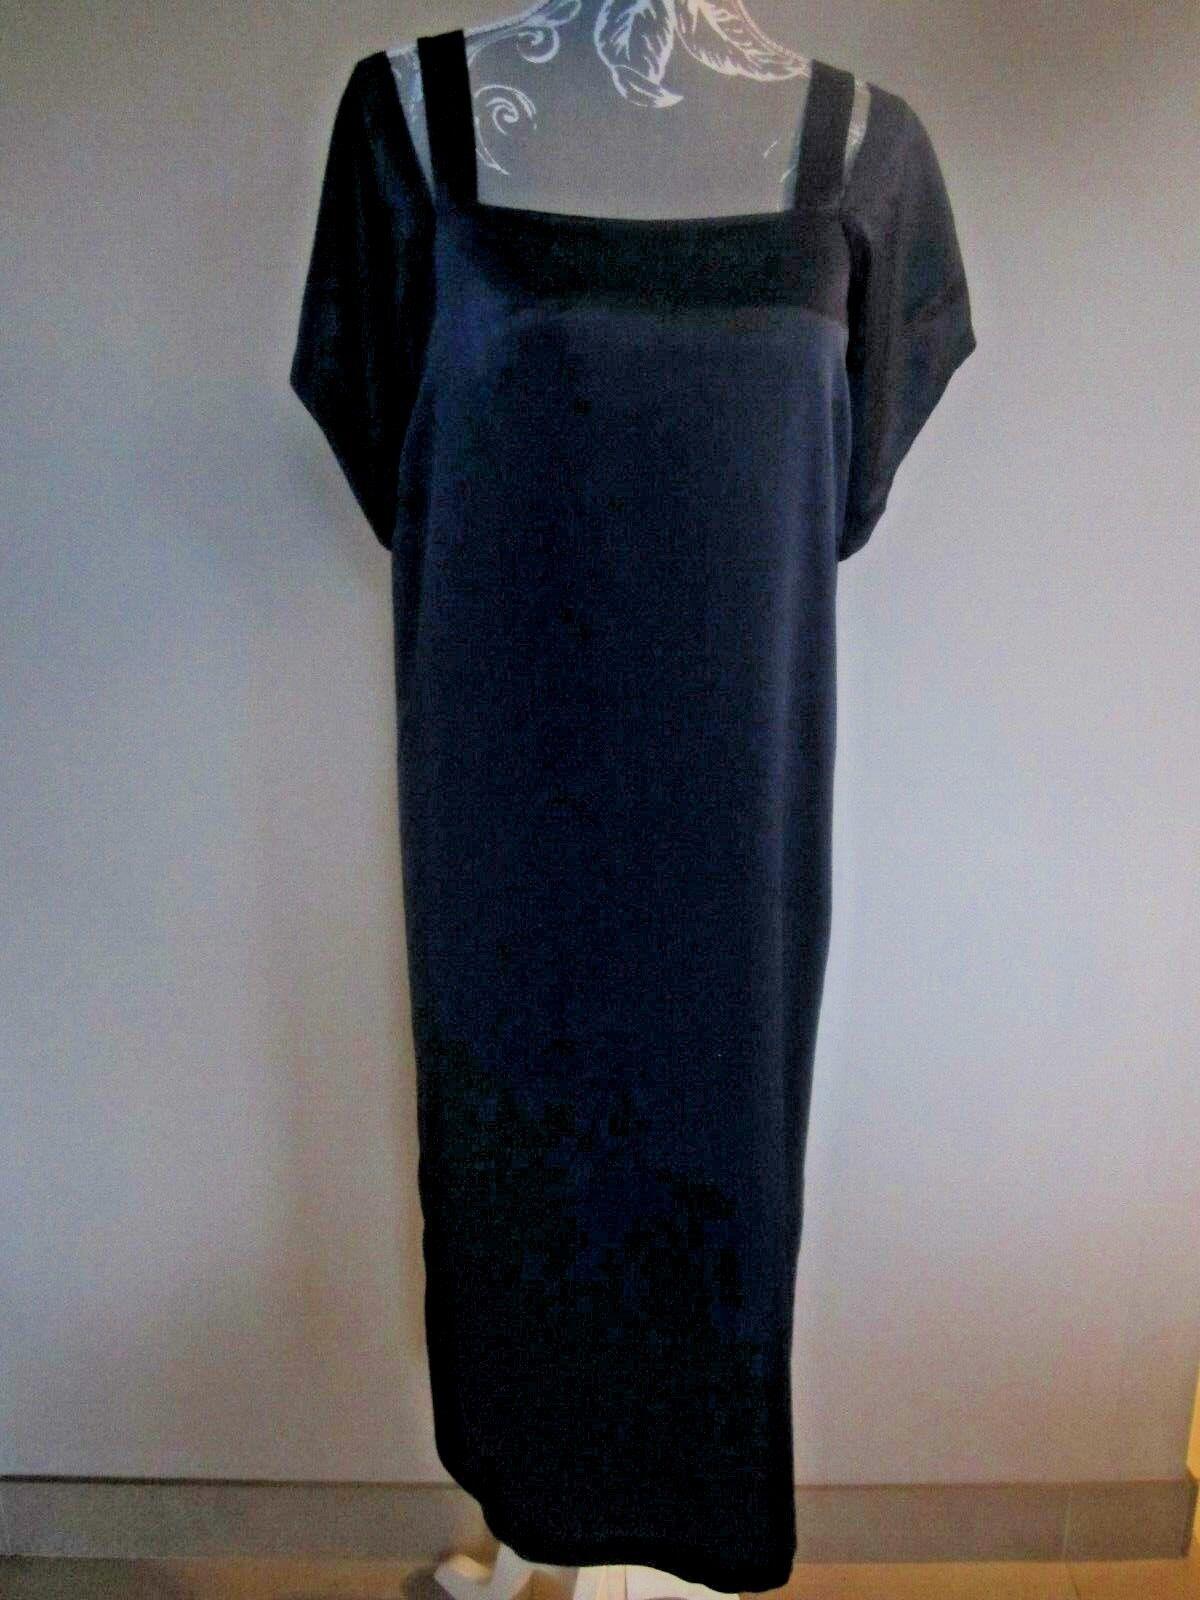 BNWT NEW 100% SILK TOPSHOP COLD SHOULDER dress Navy size ; RRP